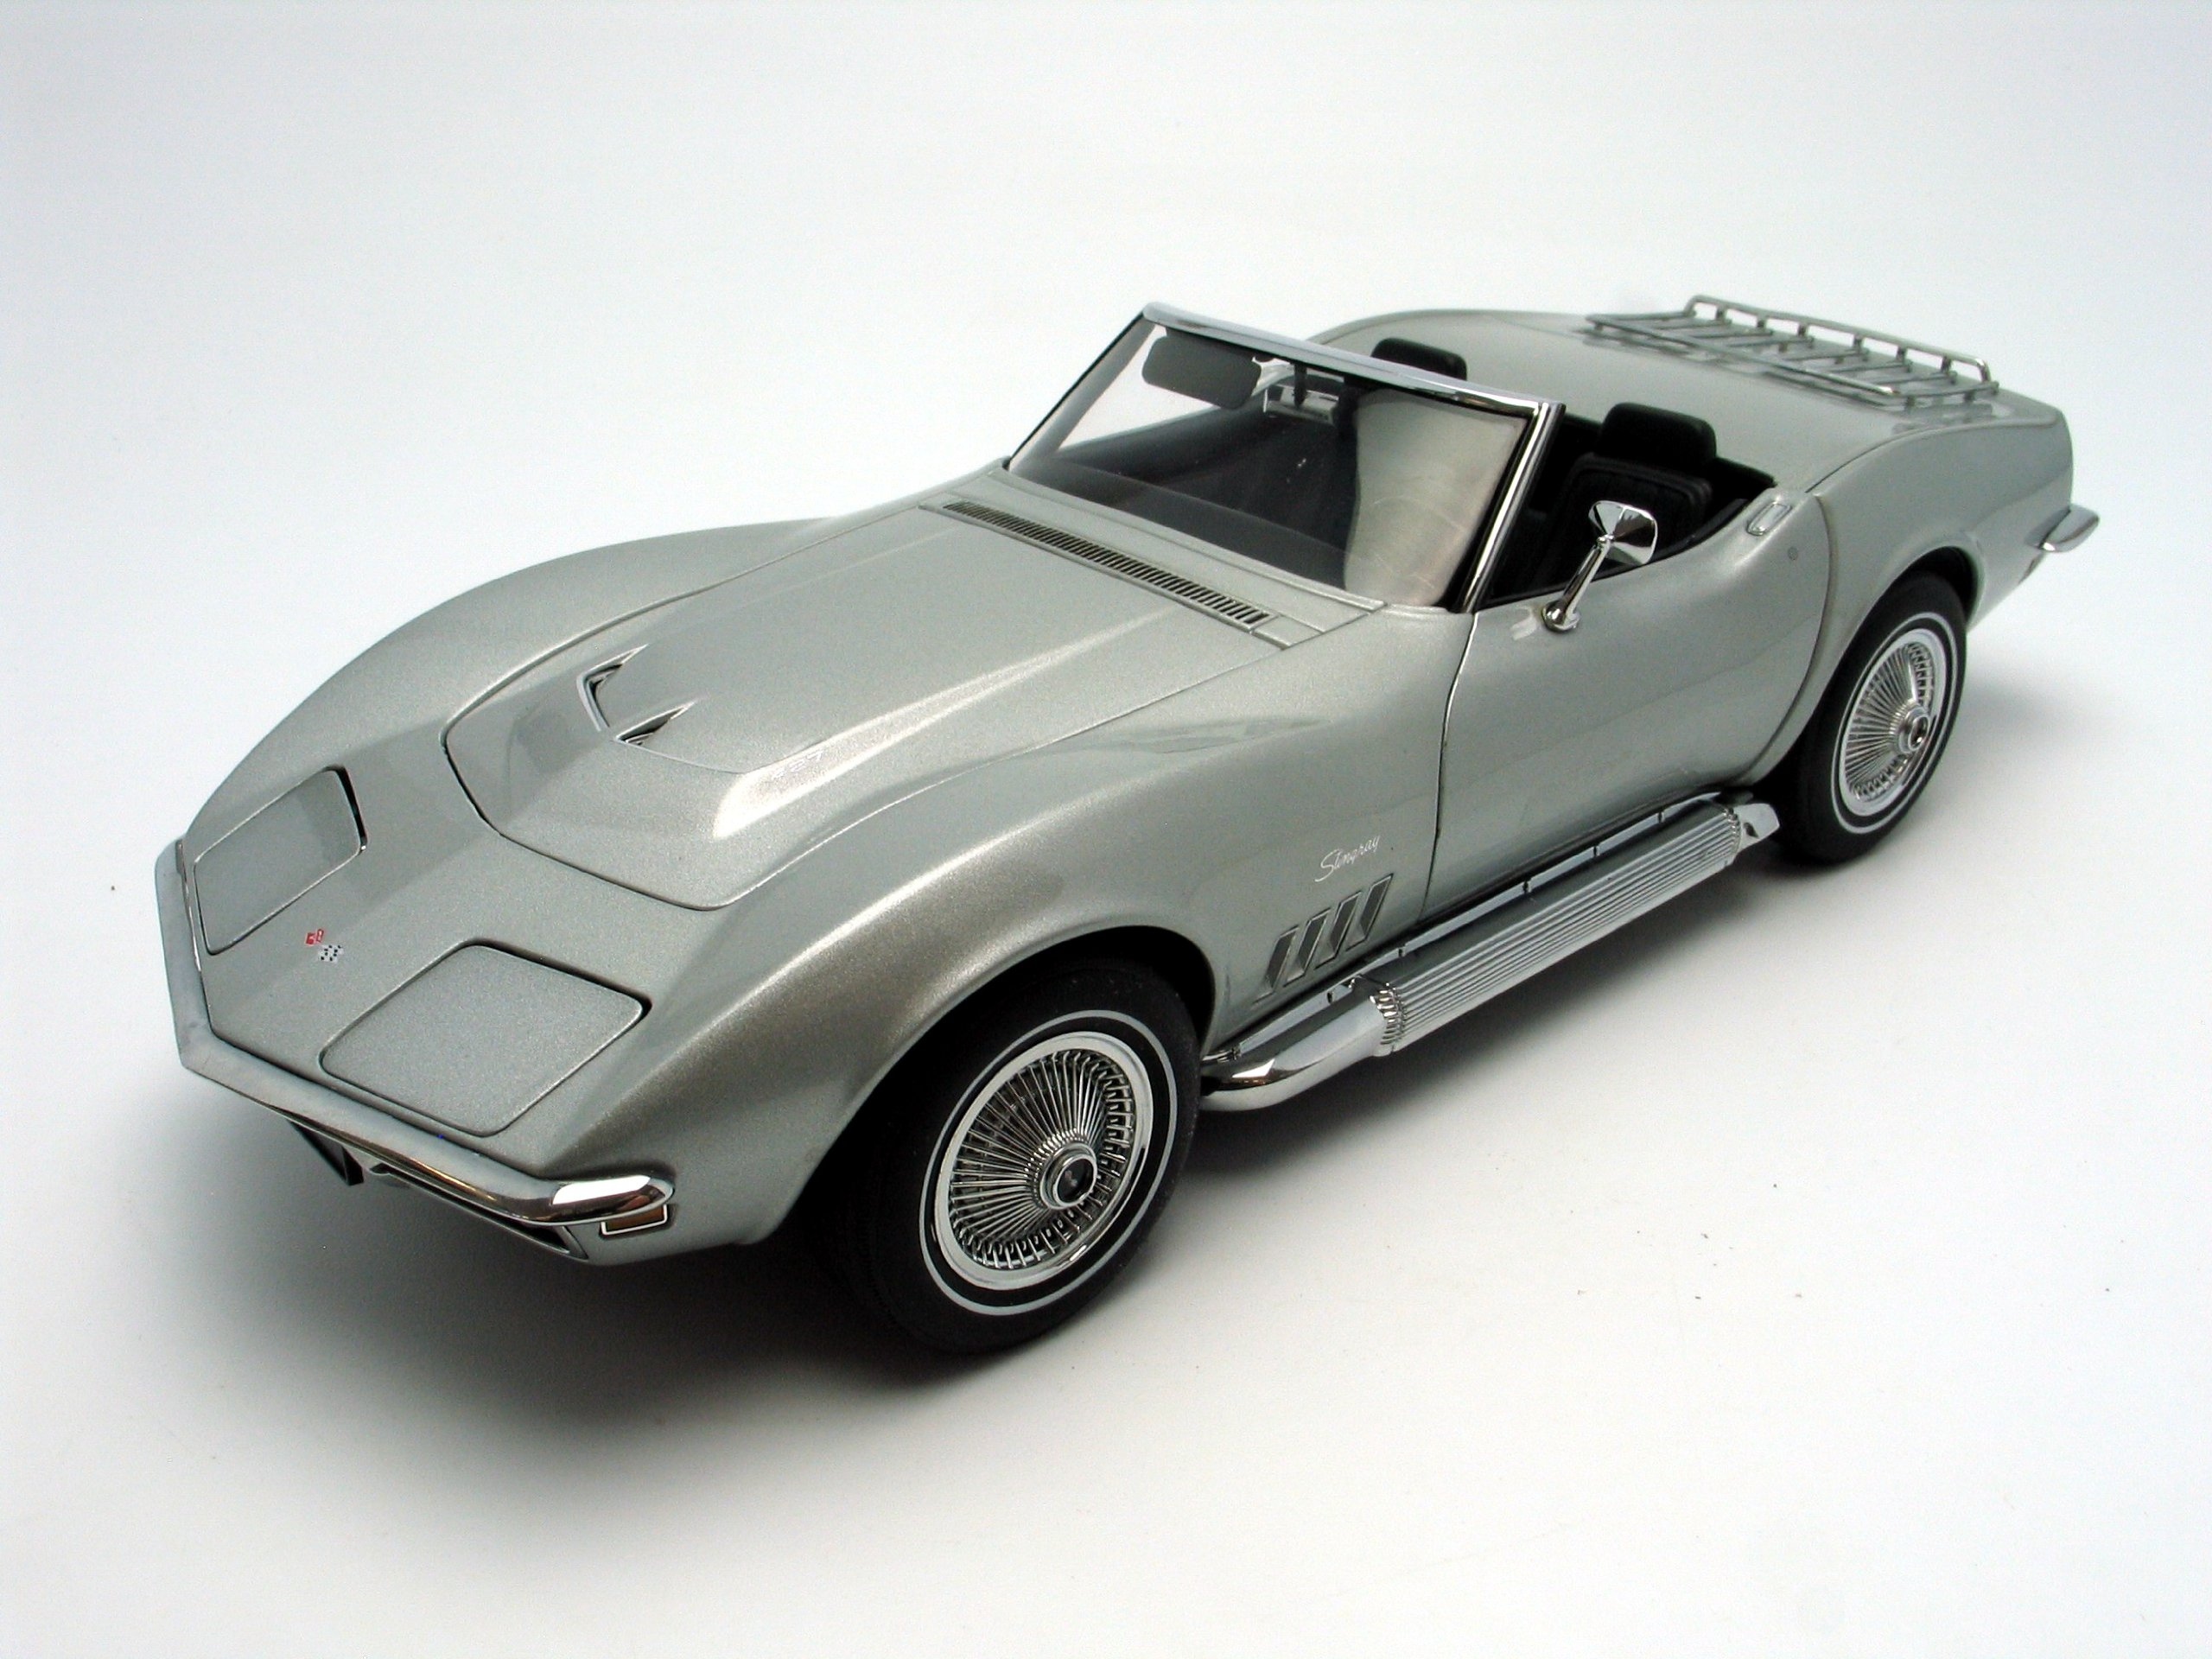 1969 chevrolet corvette diecast model car 118 autoart silver - Corvette Stingray 1969 White